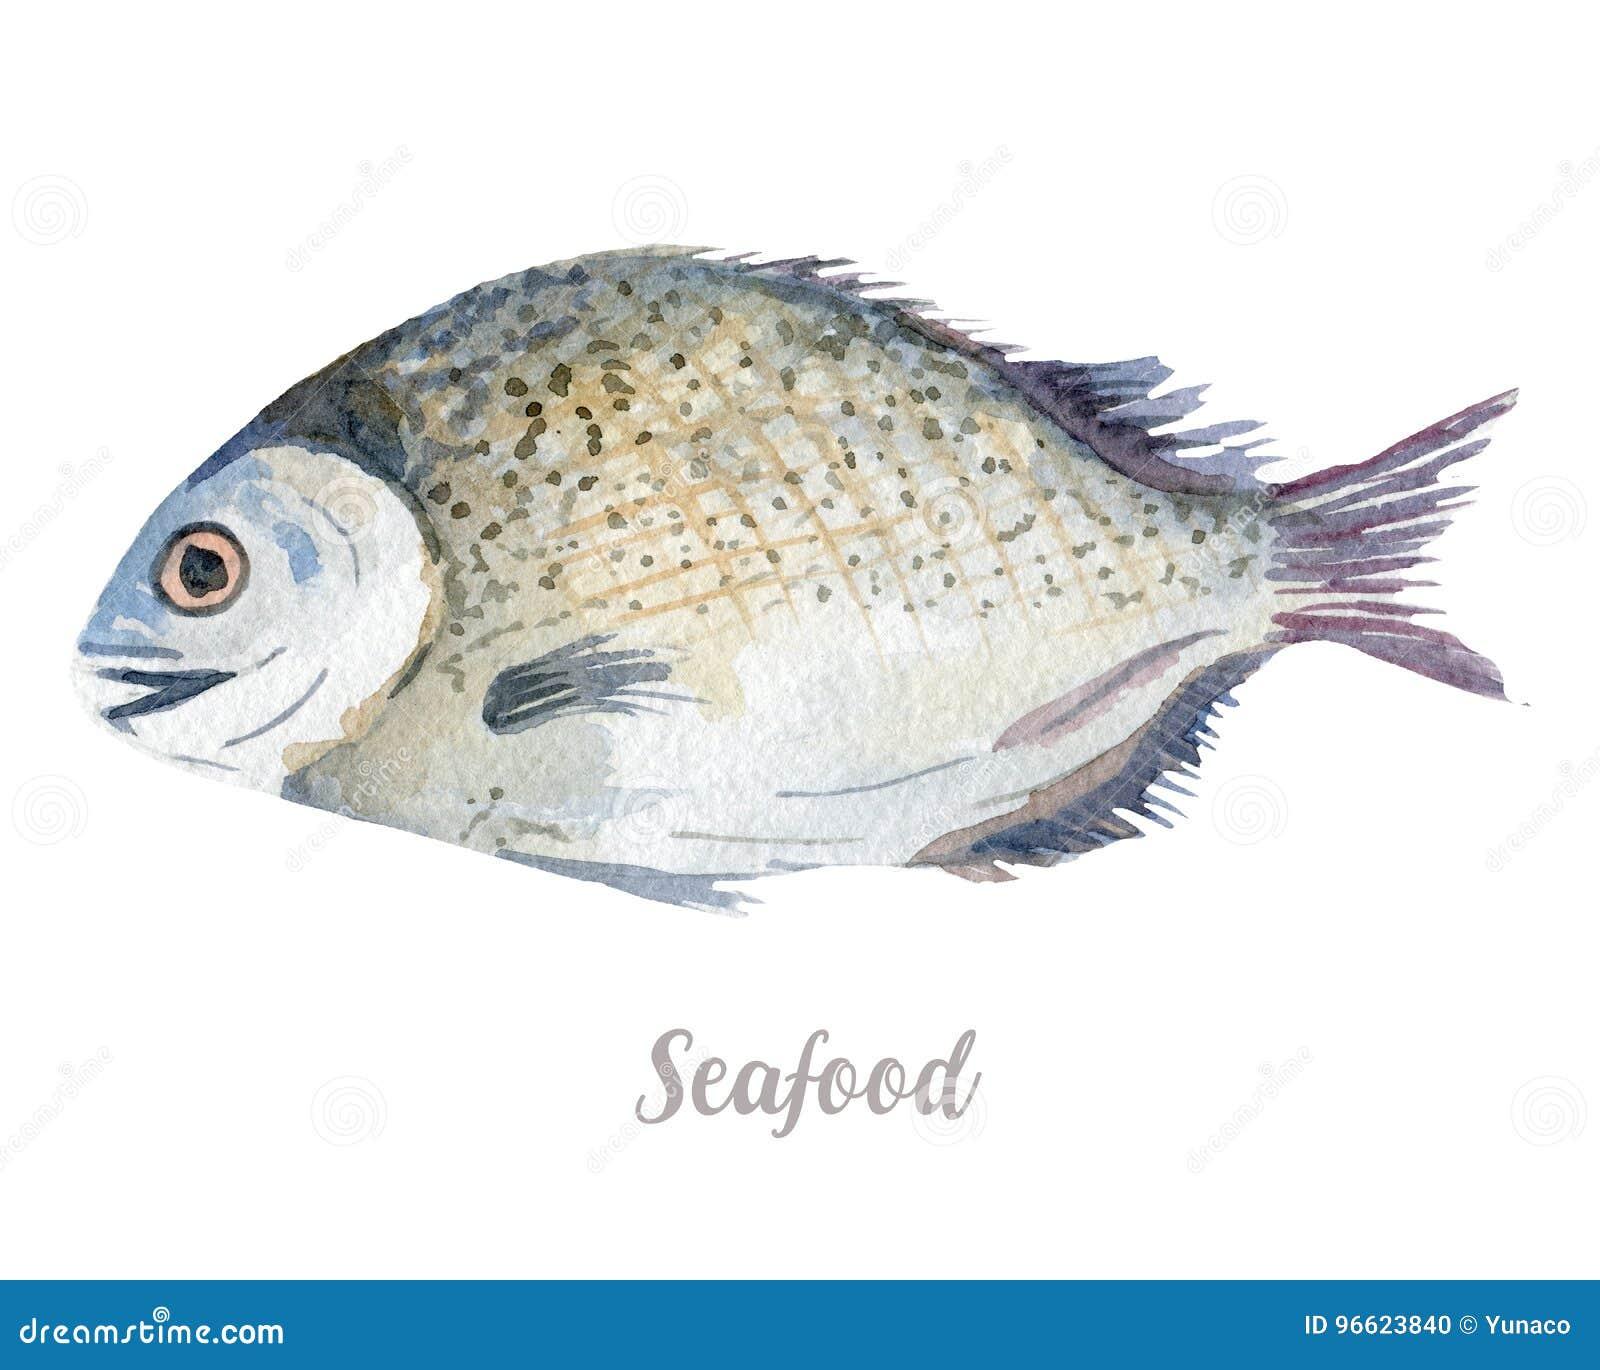 Waterverfhand getrokken vissen verse zeevruchtenillustratie op witte achtergrond